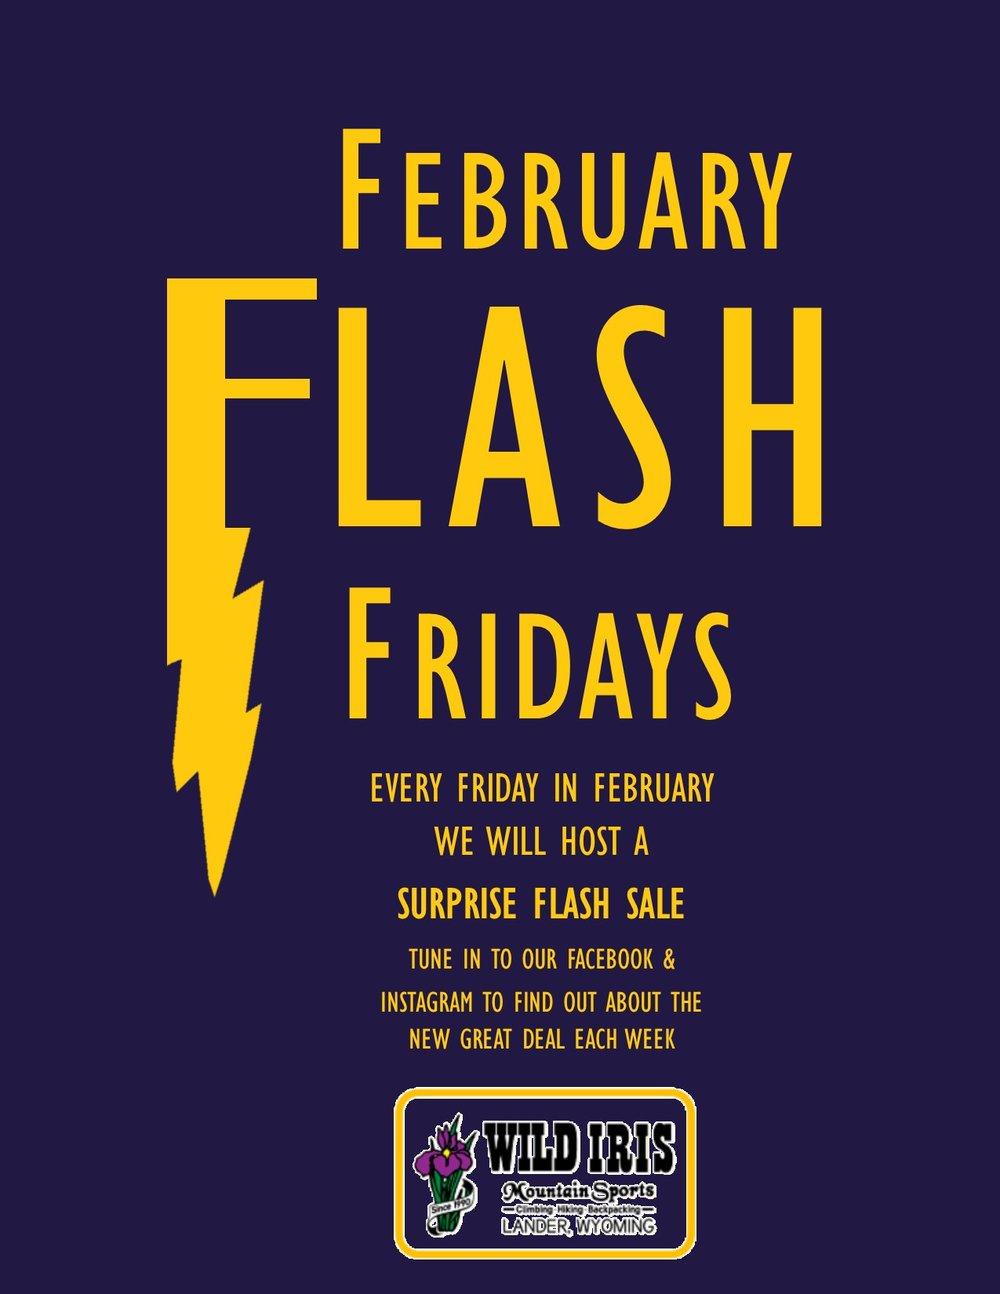 Feb Flash Fridays 3.jpg